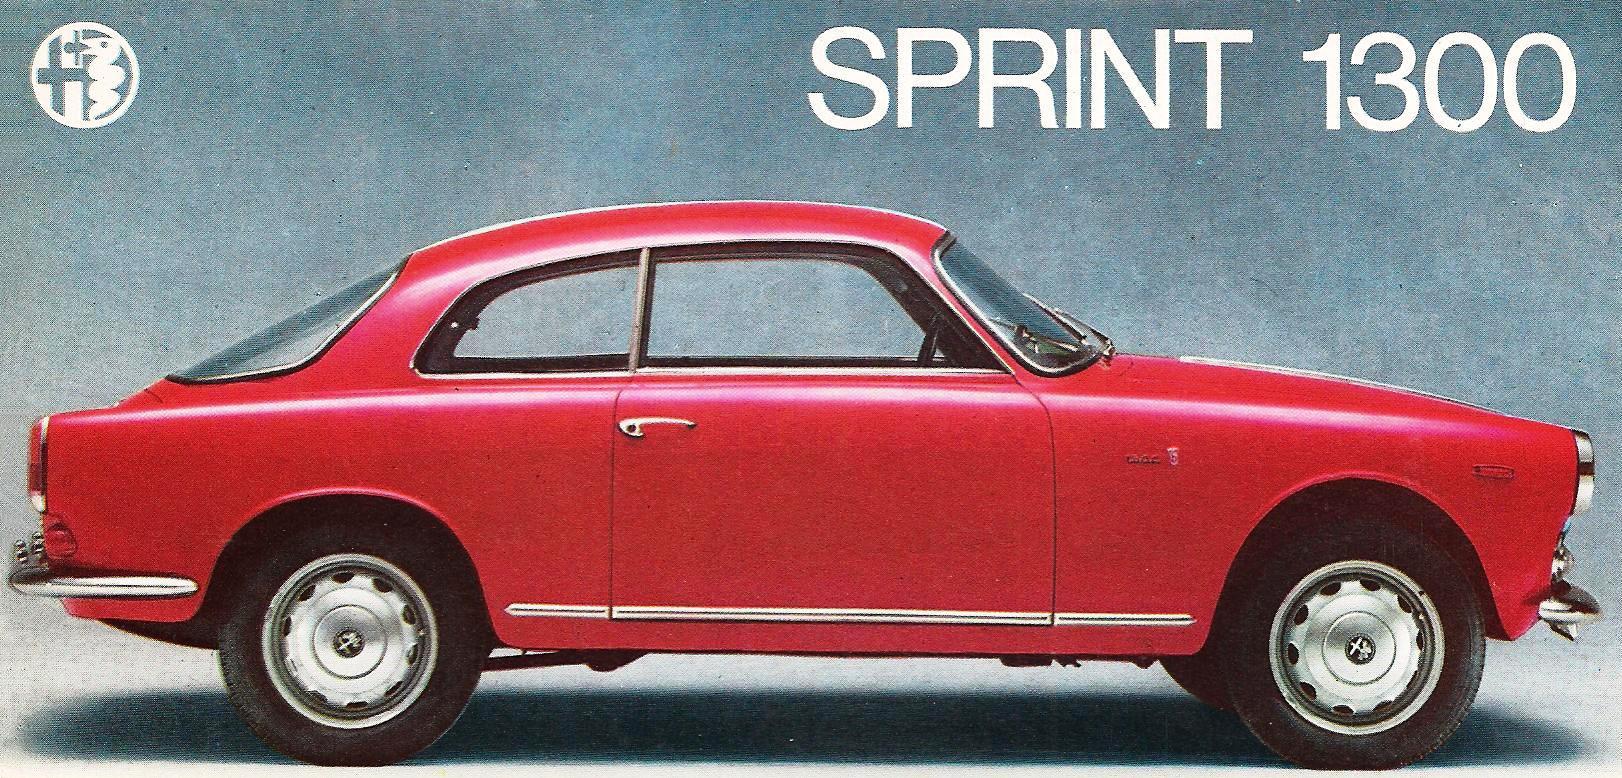 Alfa Romeo Sprint 1300 Brochure